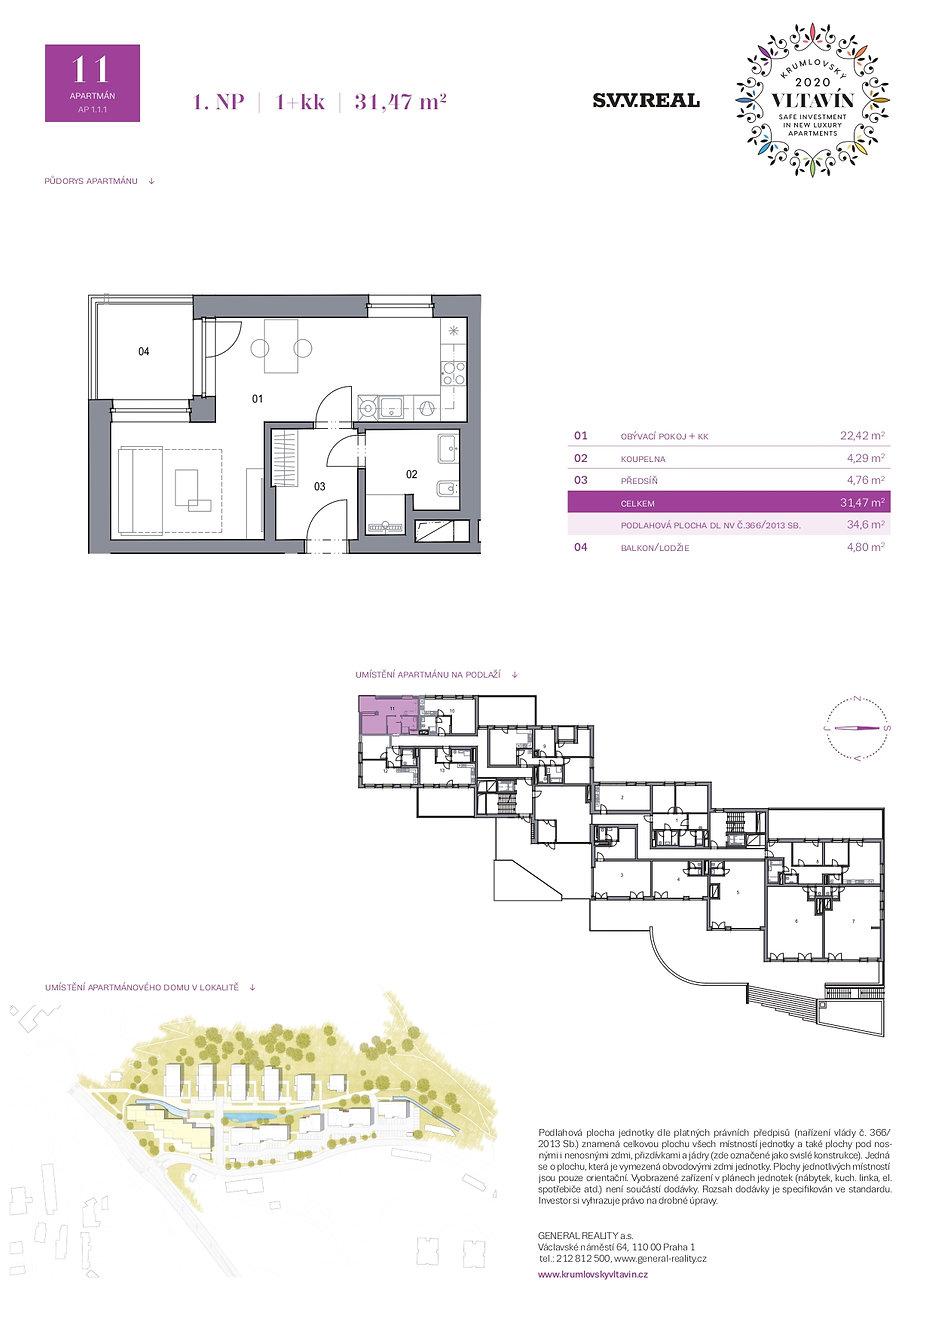 GR_krumlovsky-vltavin_bytove-karty-apartmany_1NP_A11_page-0001.jpg